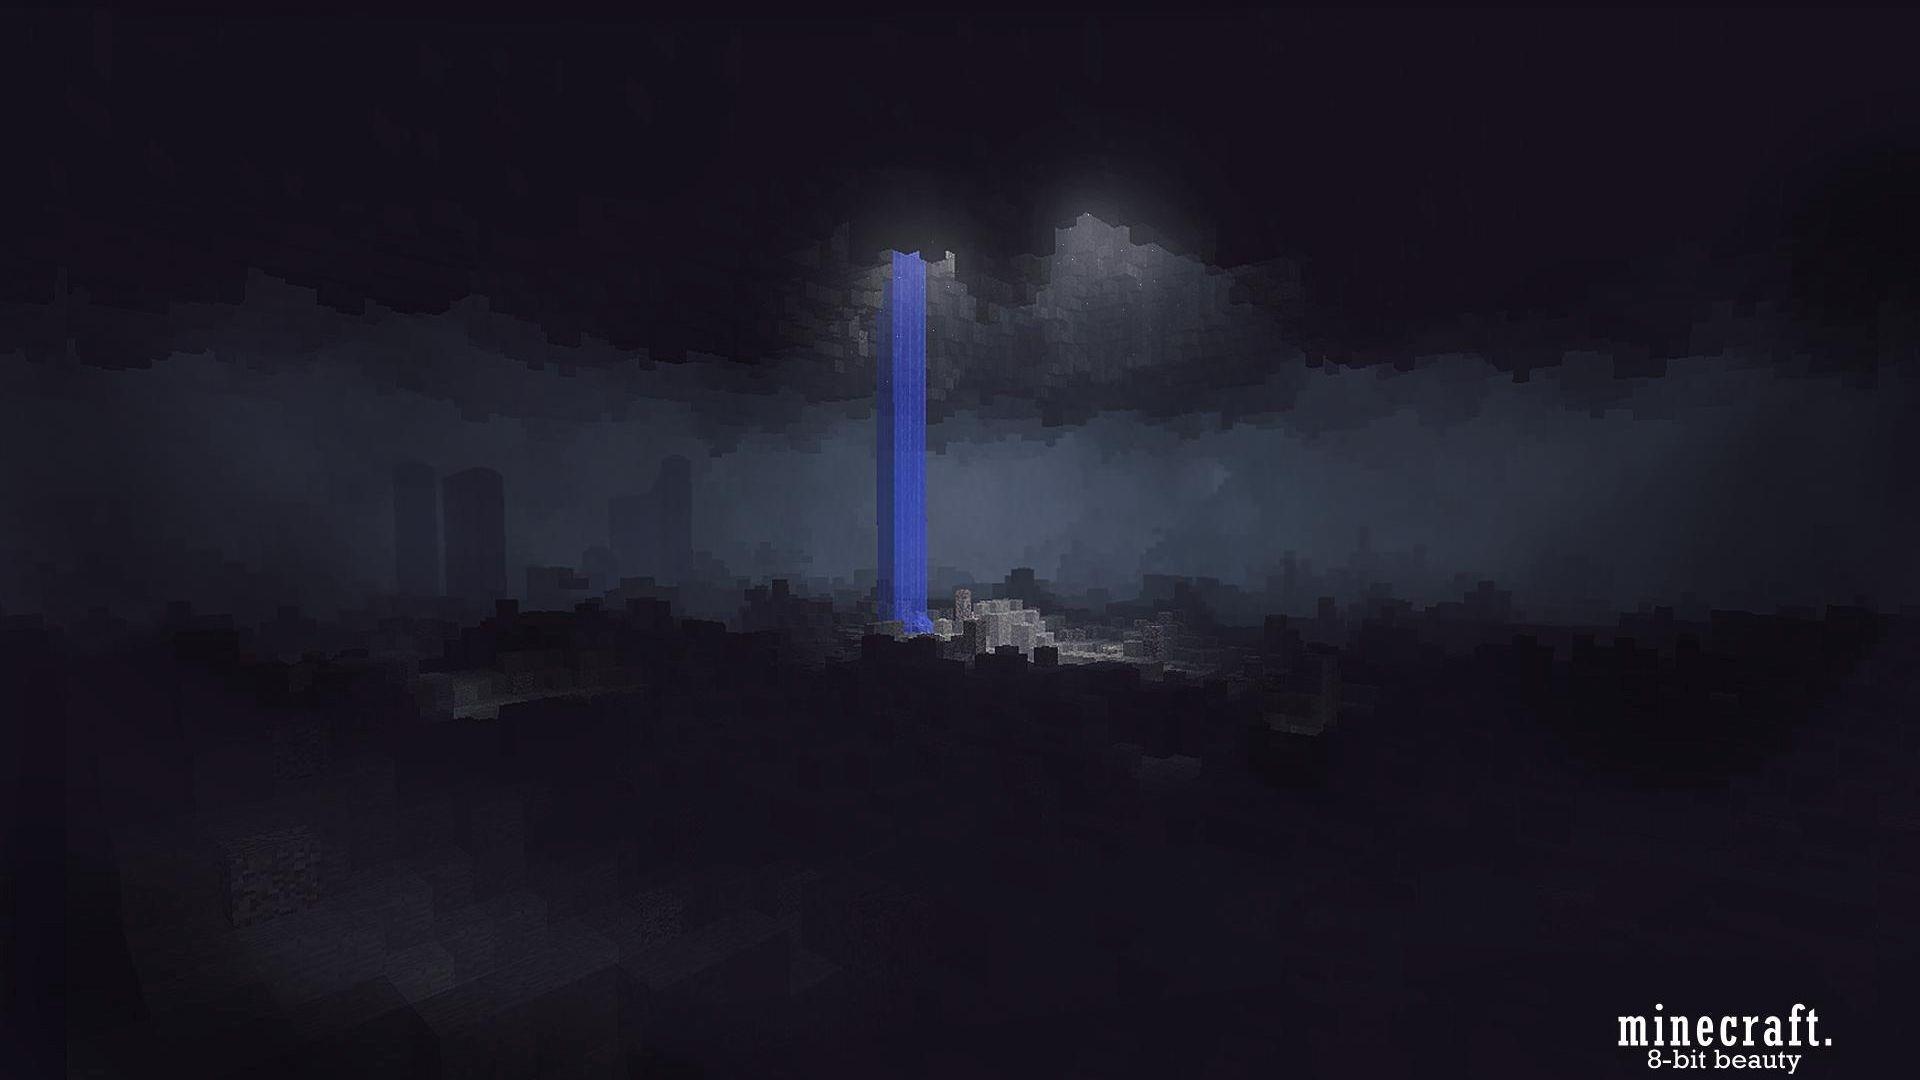 Must see Wallpaper Minecraft Night - 46151bd53cd4c741d90fe1ab9614eb79  Pic_74784.jpg